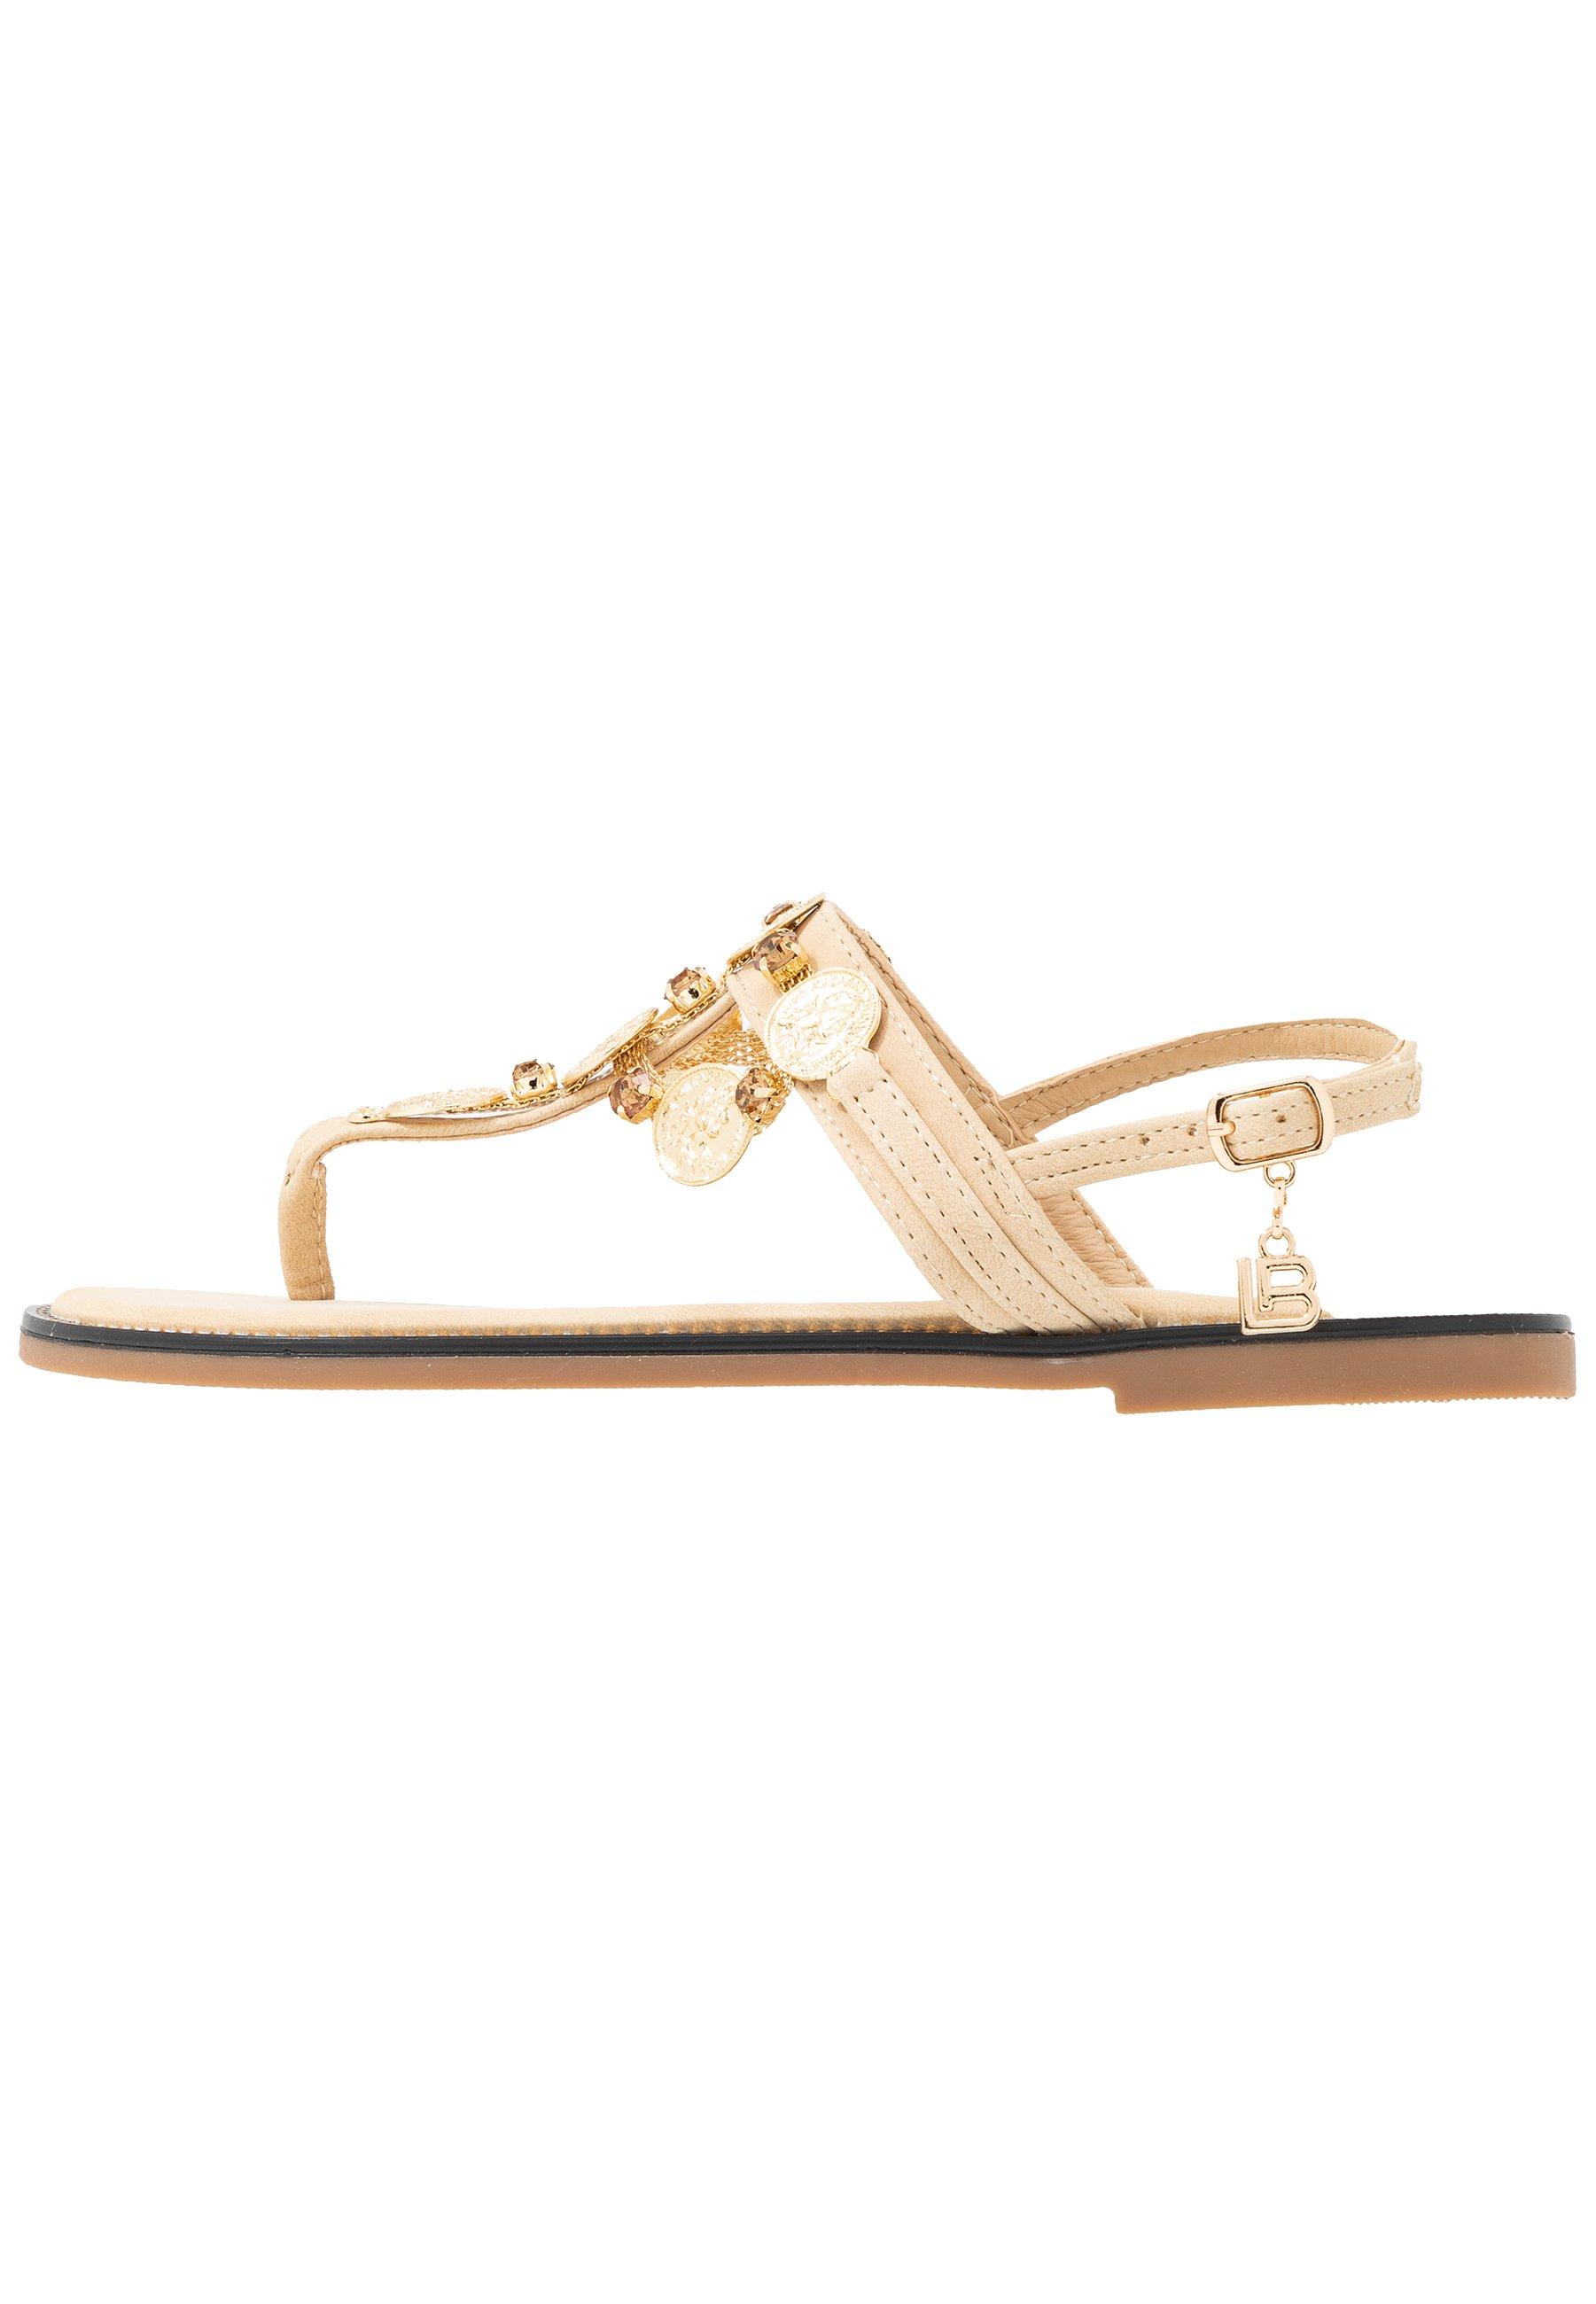 Laura Biagiotti Flip Flops - Beige/beige